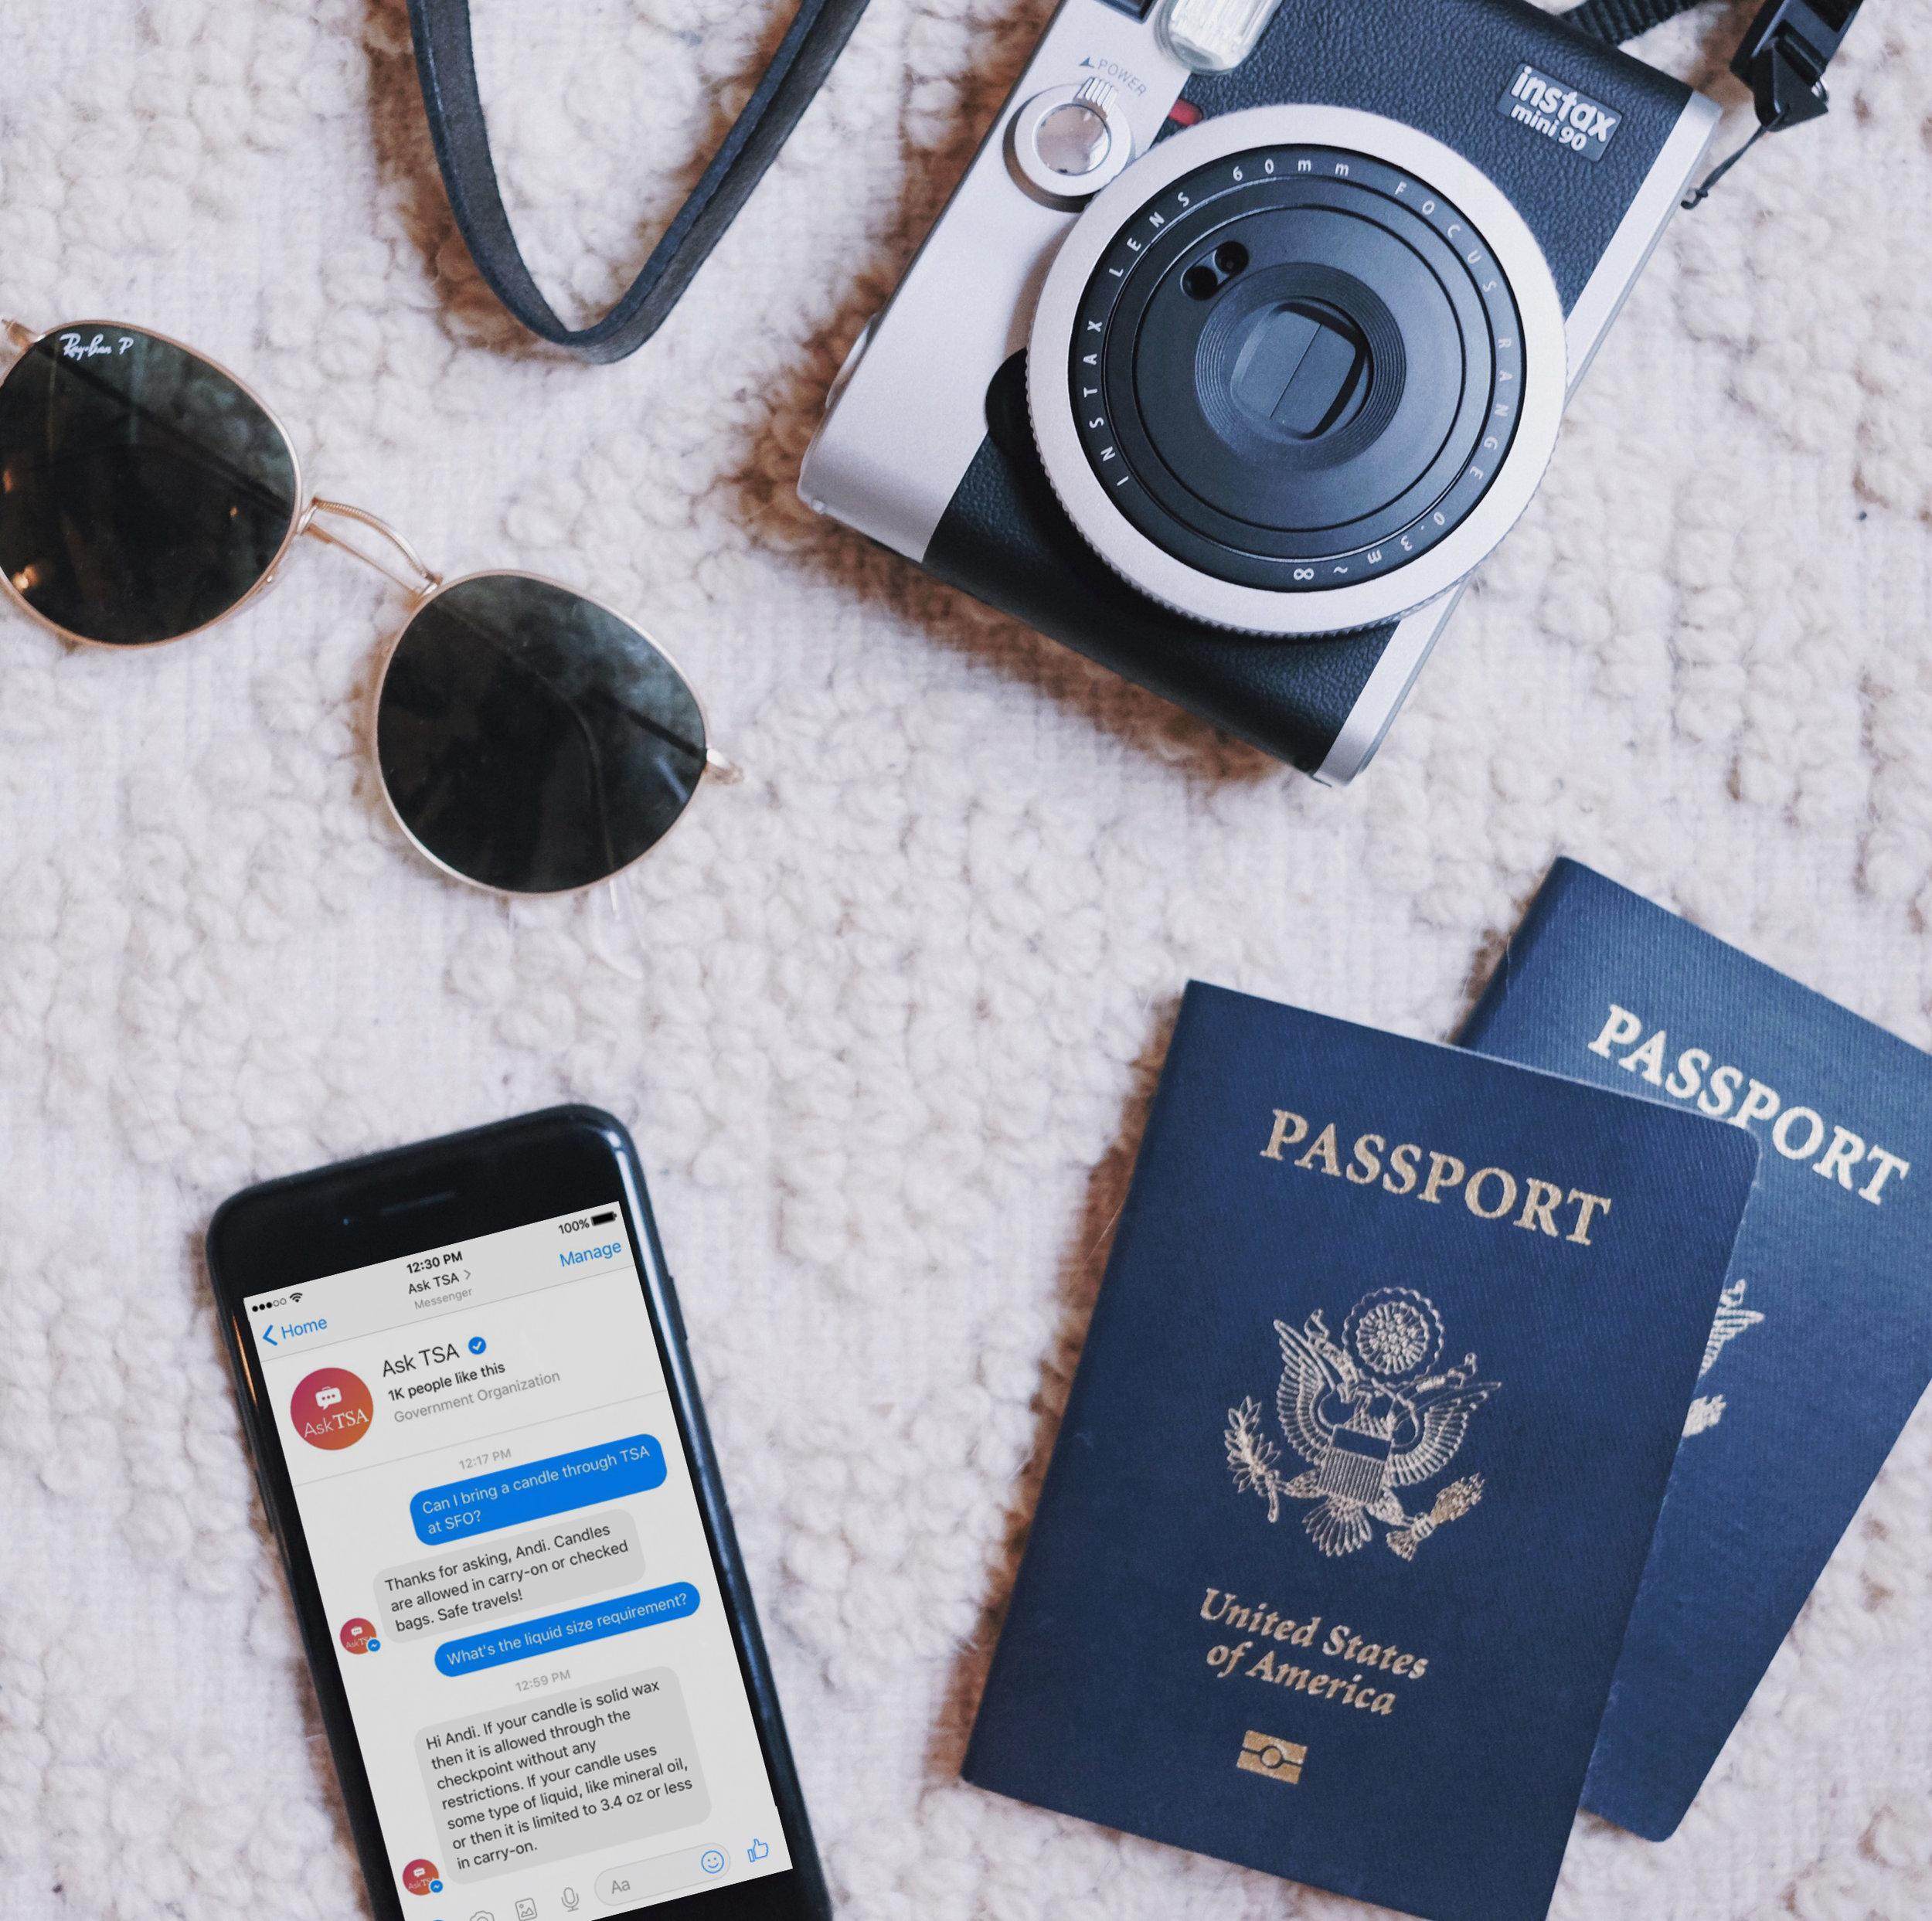 Lifestyle Instagram content for Messenger highlighting the Ask TSA bot